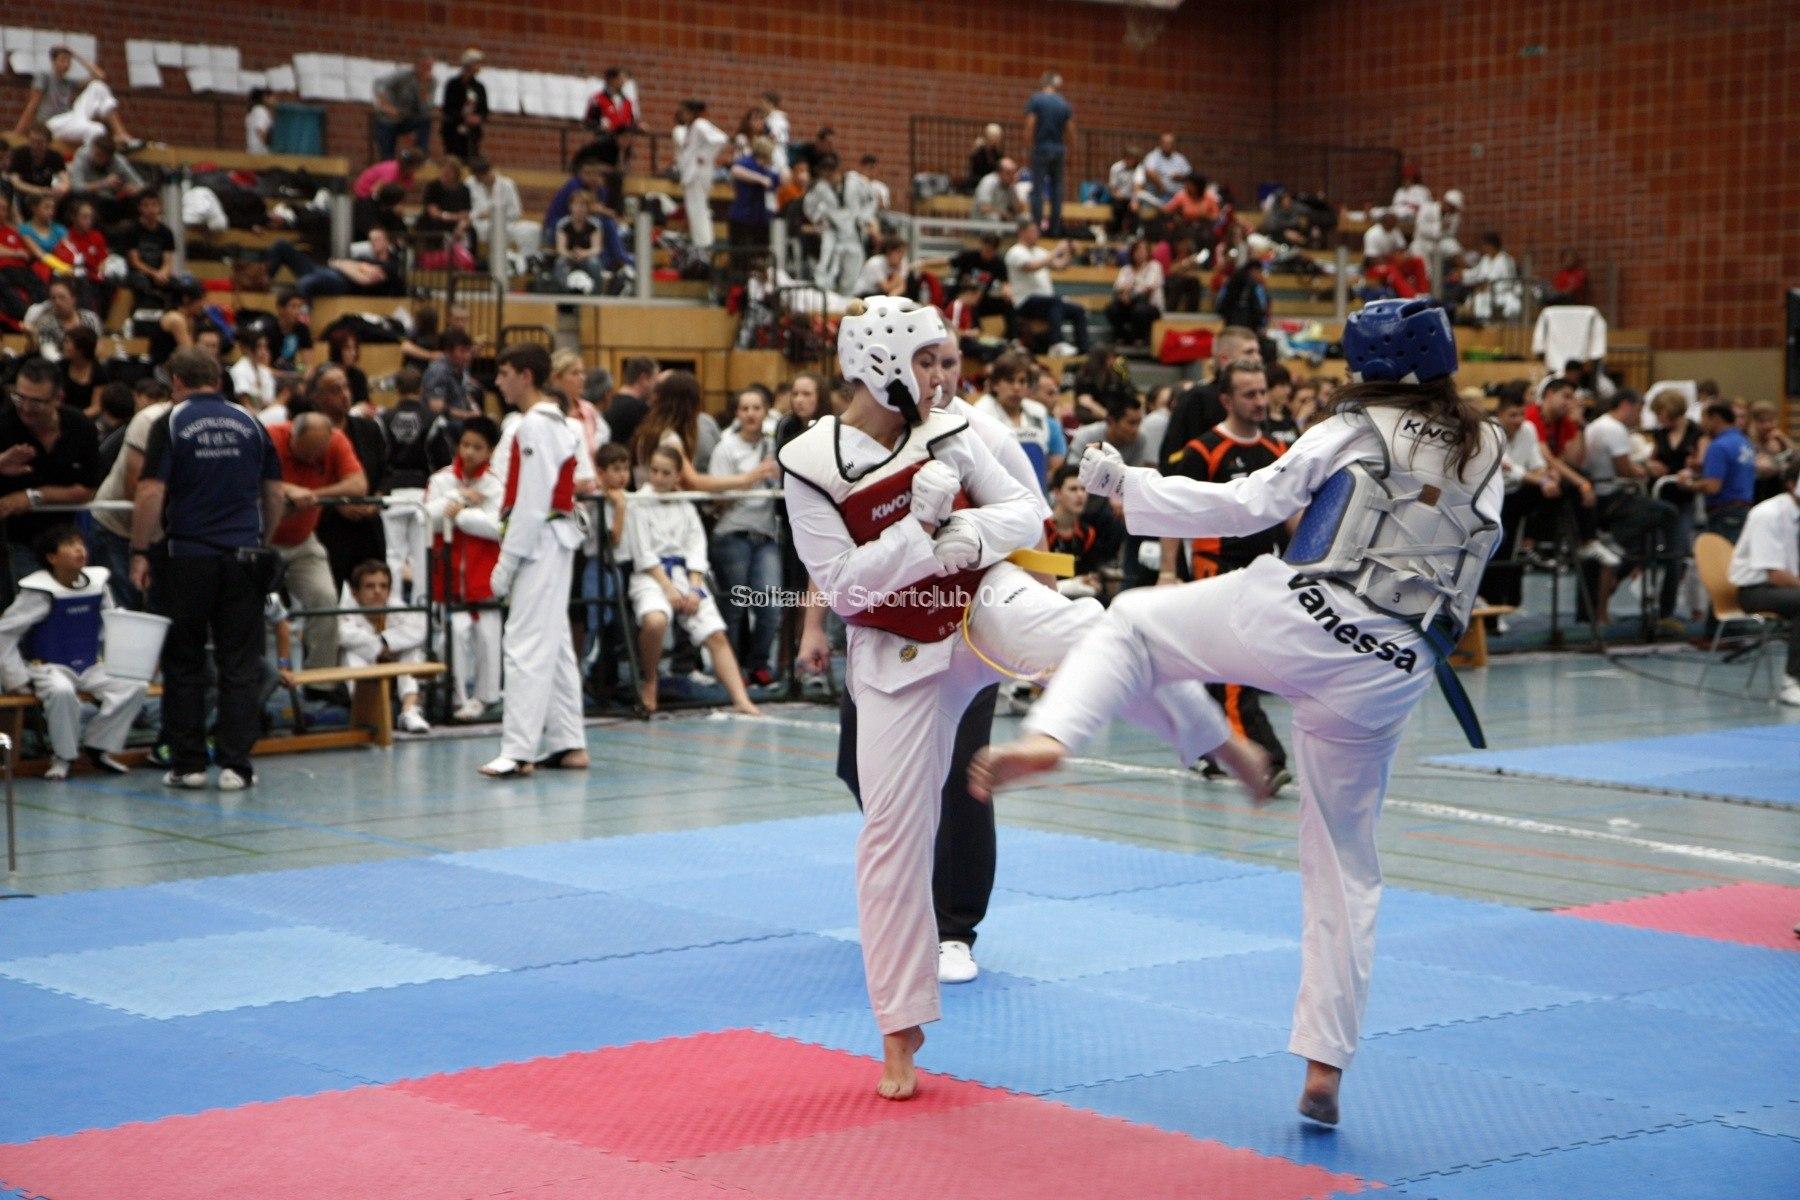 2011-06-25-bavaria-open-0213